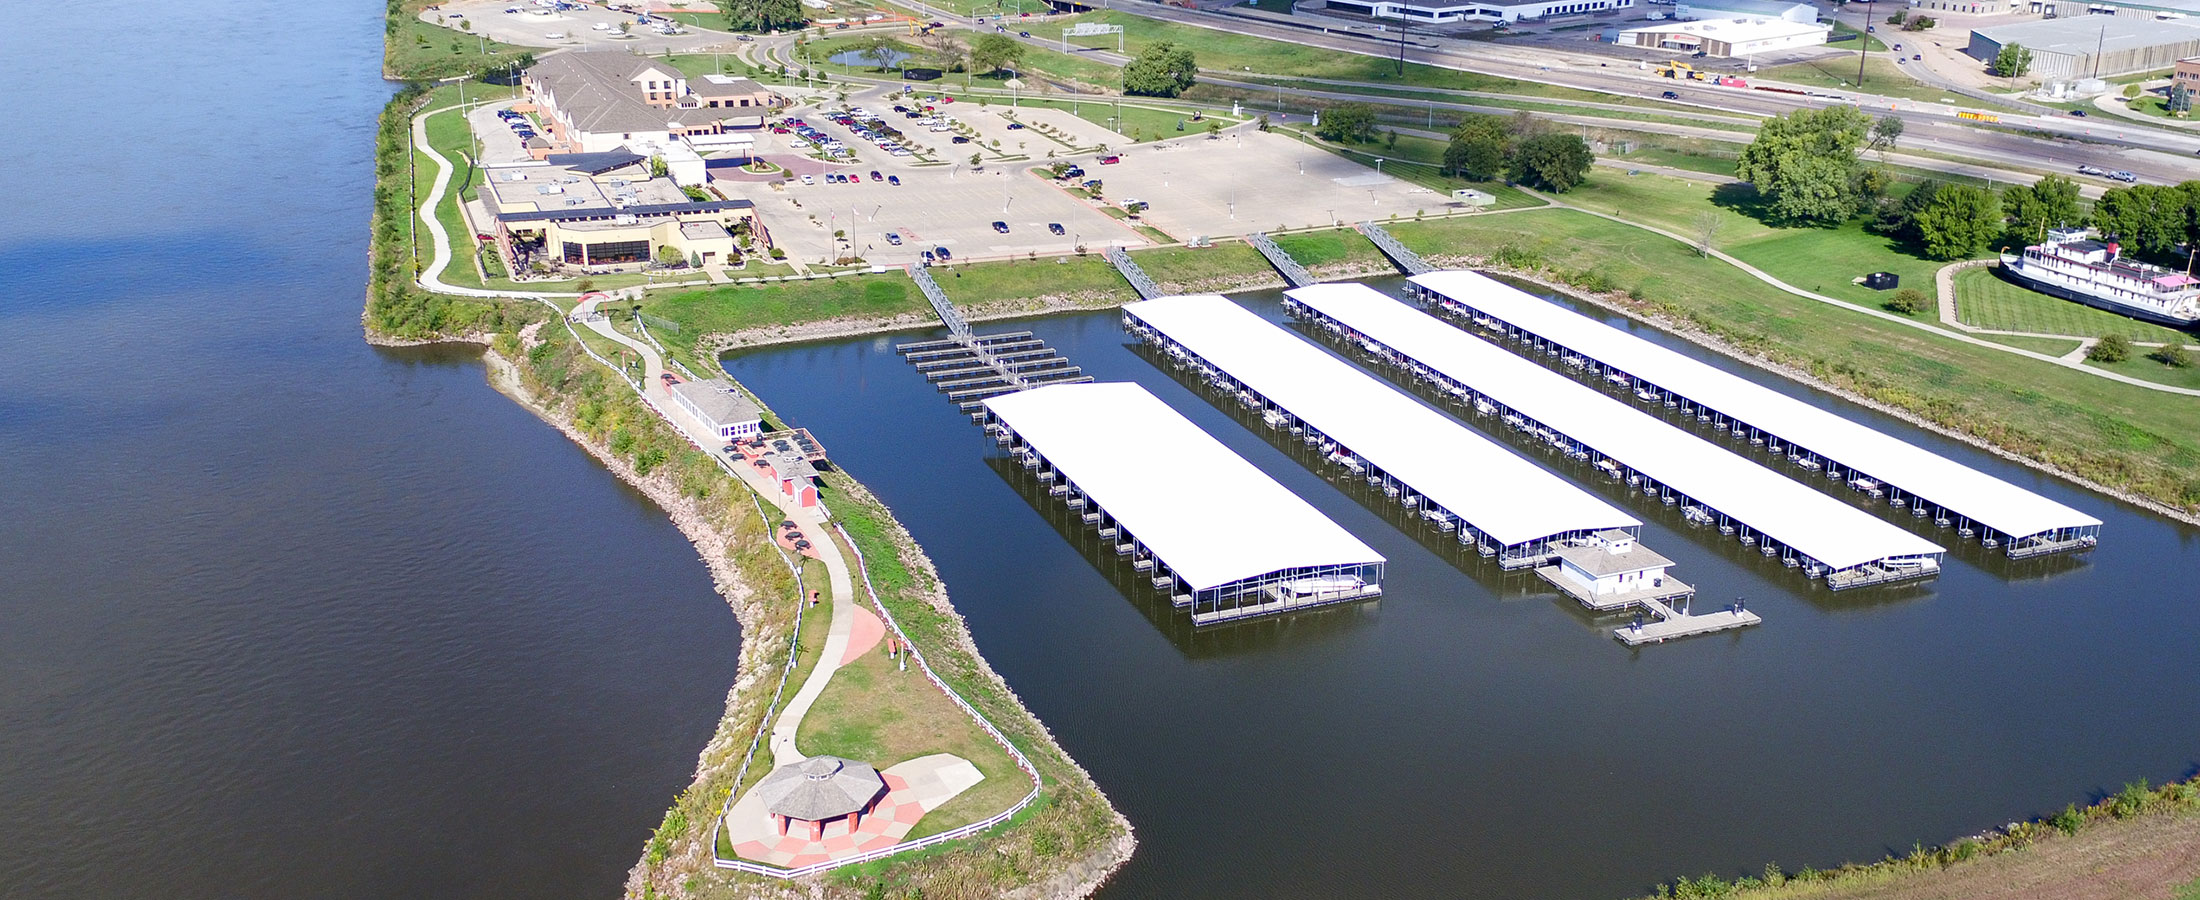 Sioux City Marina aerial